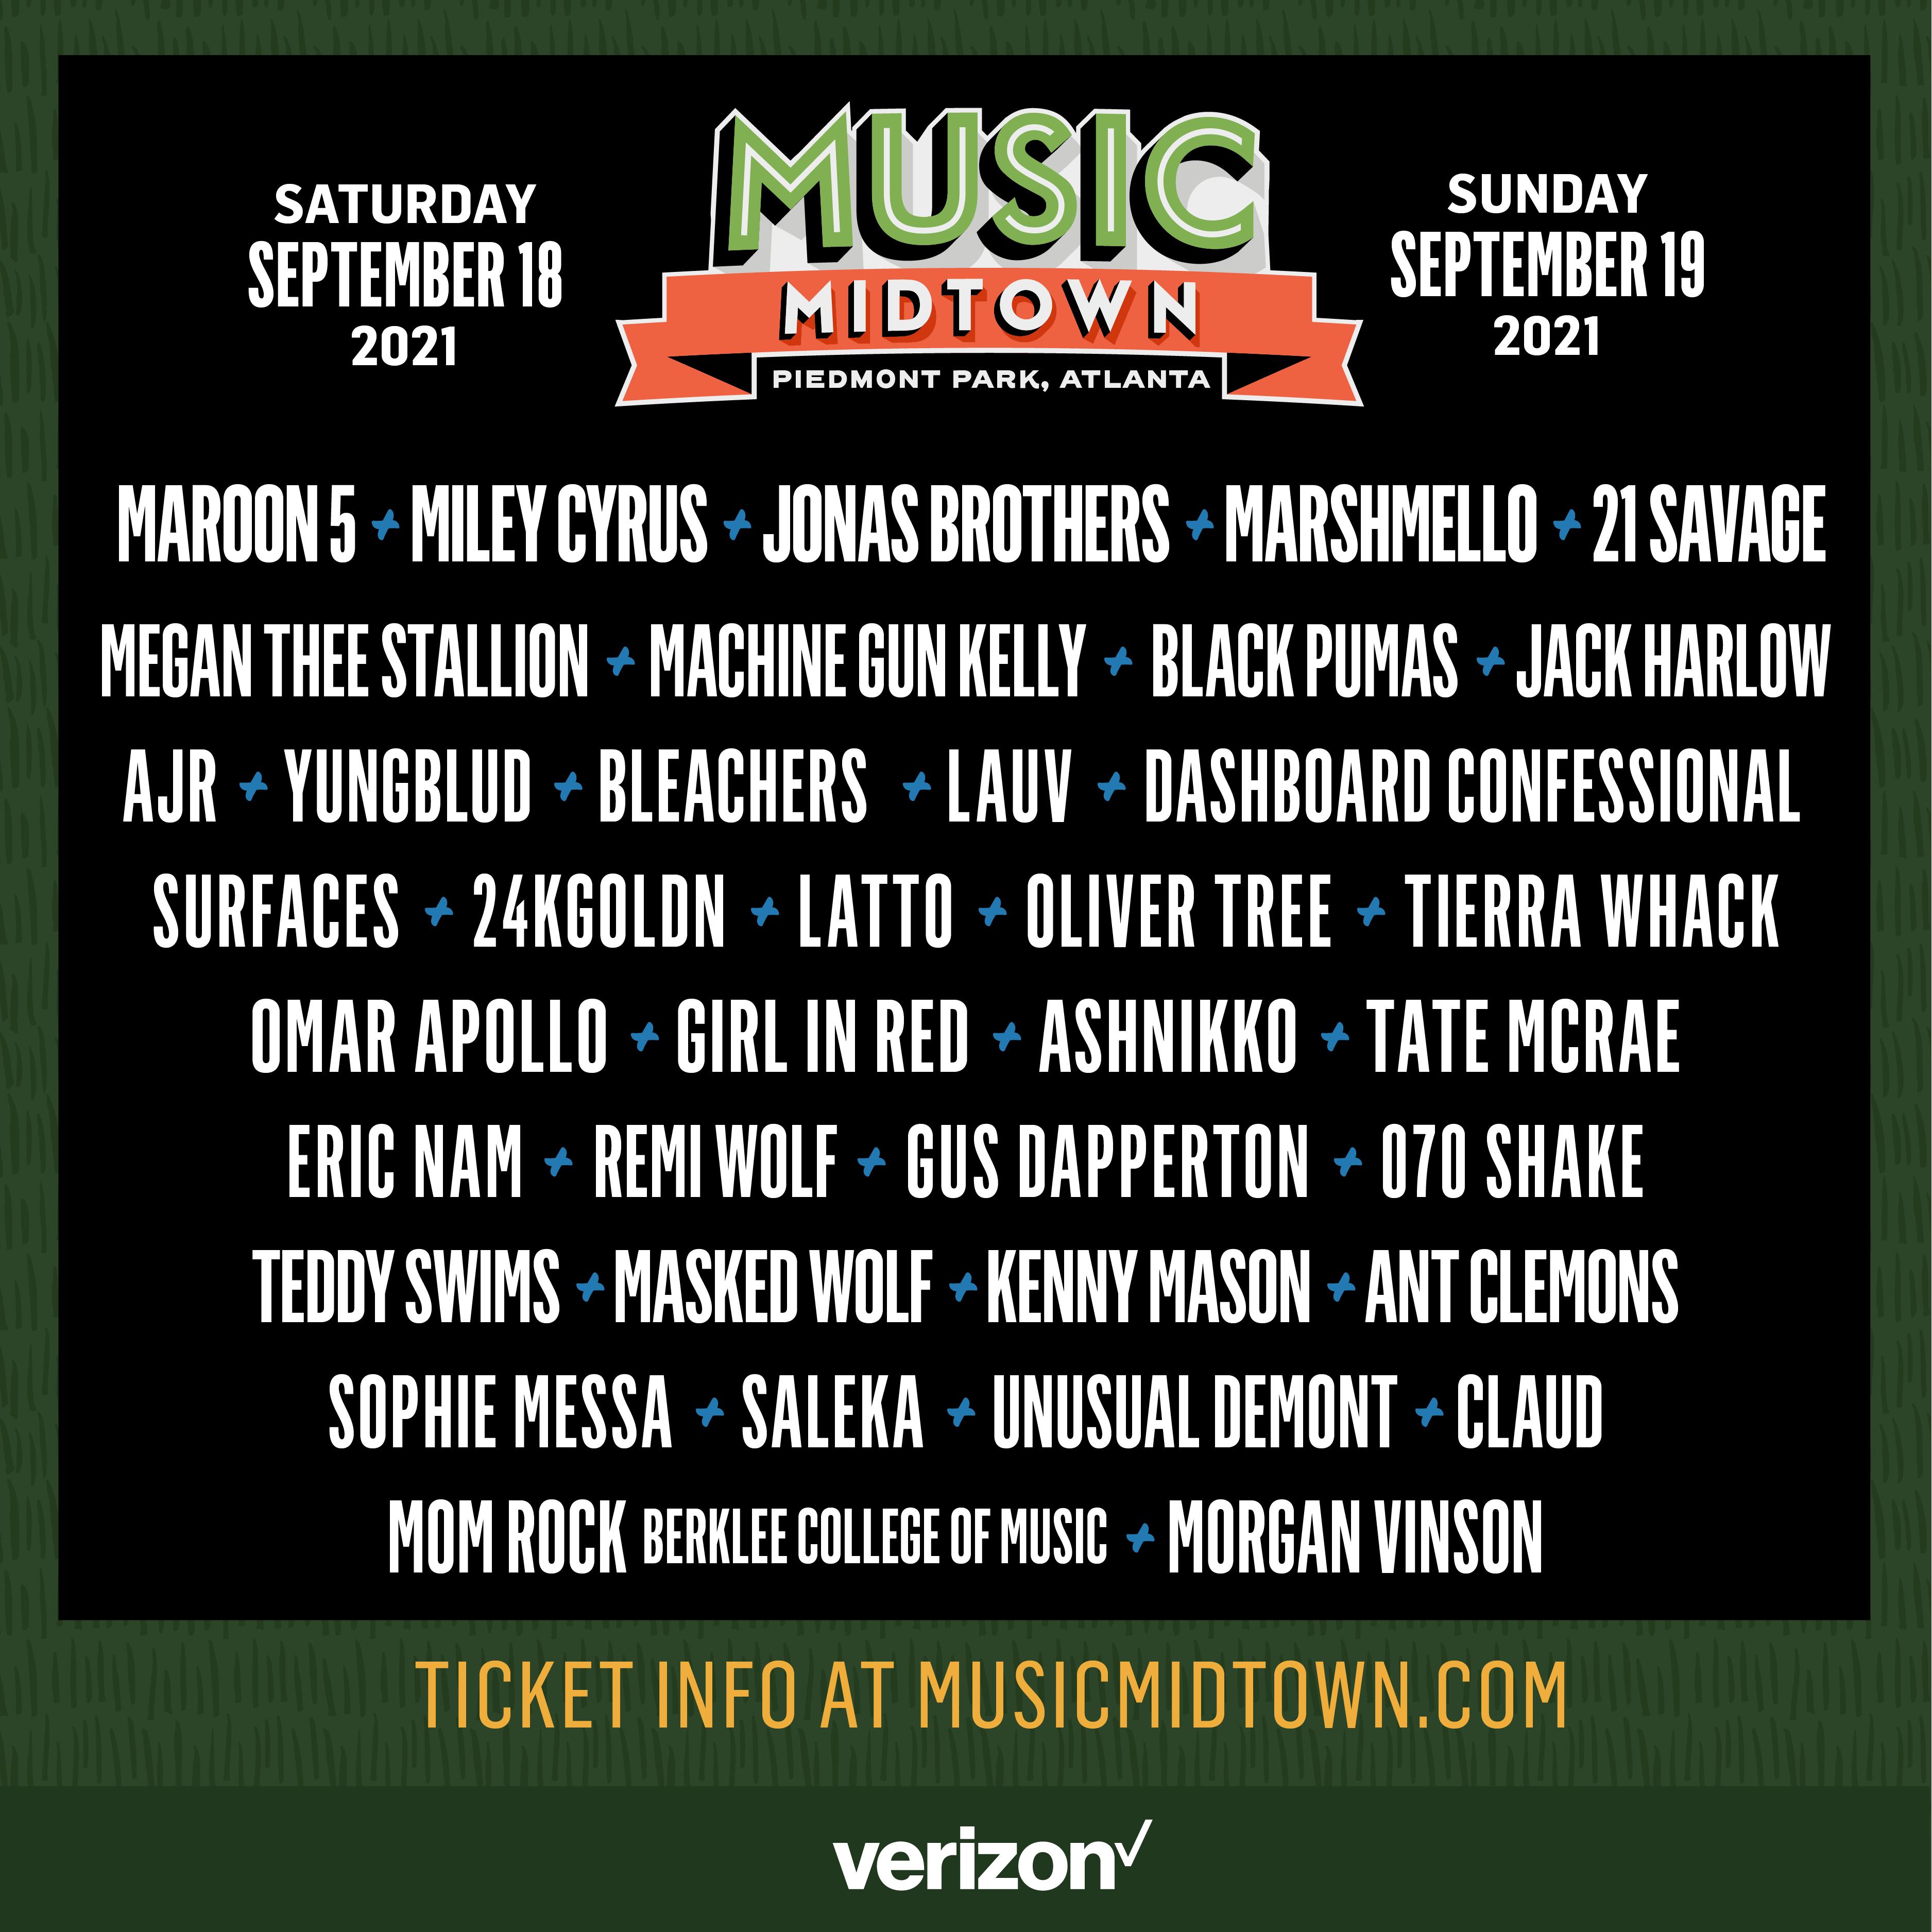 Sept 18 & 19 – Music Midtown